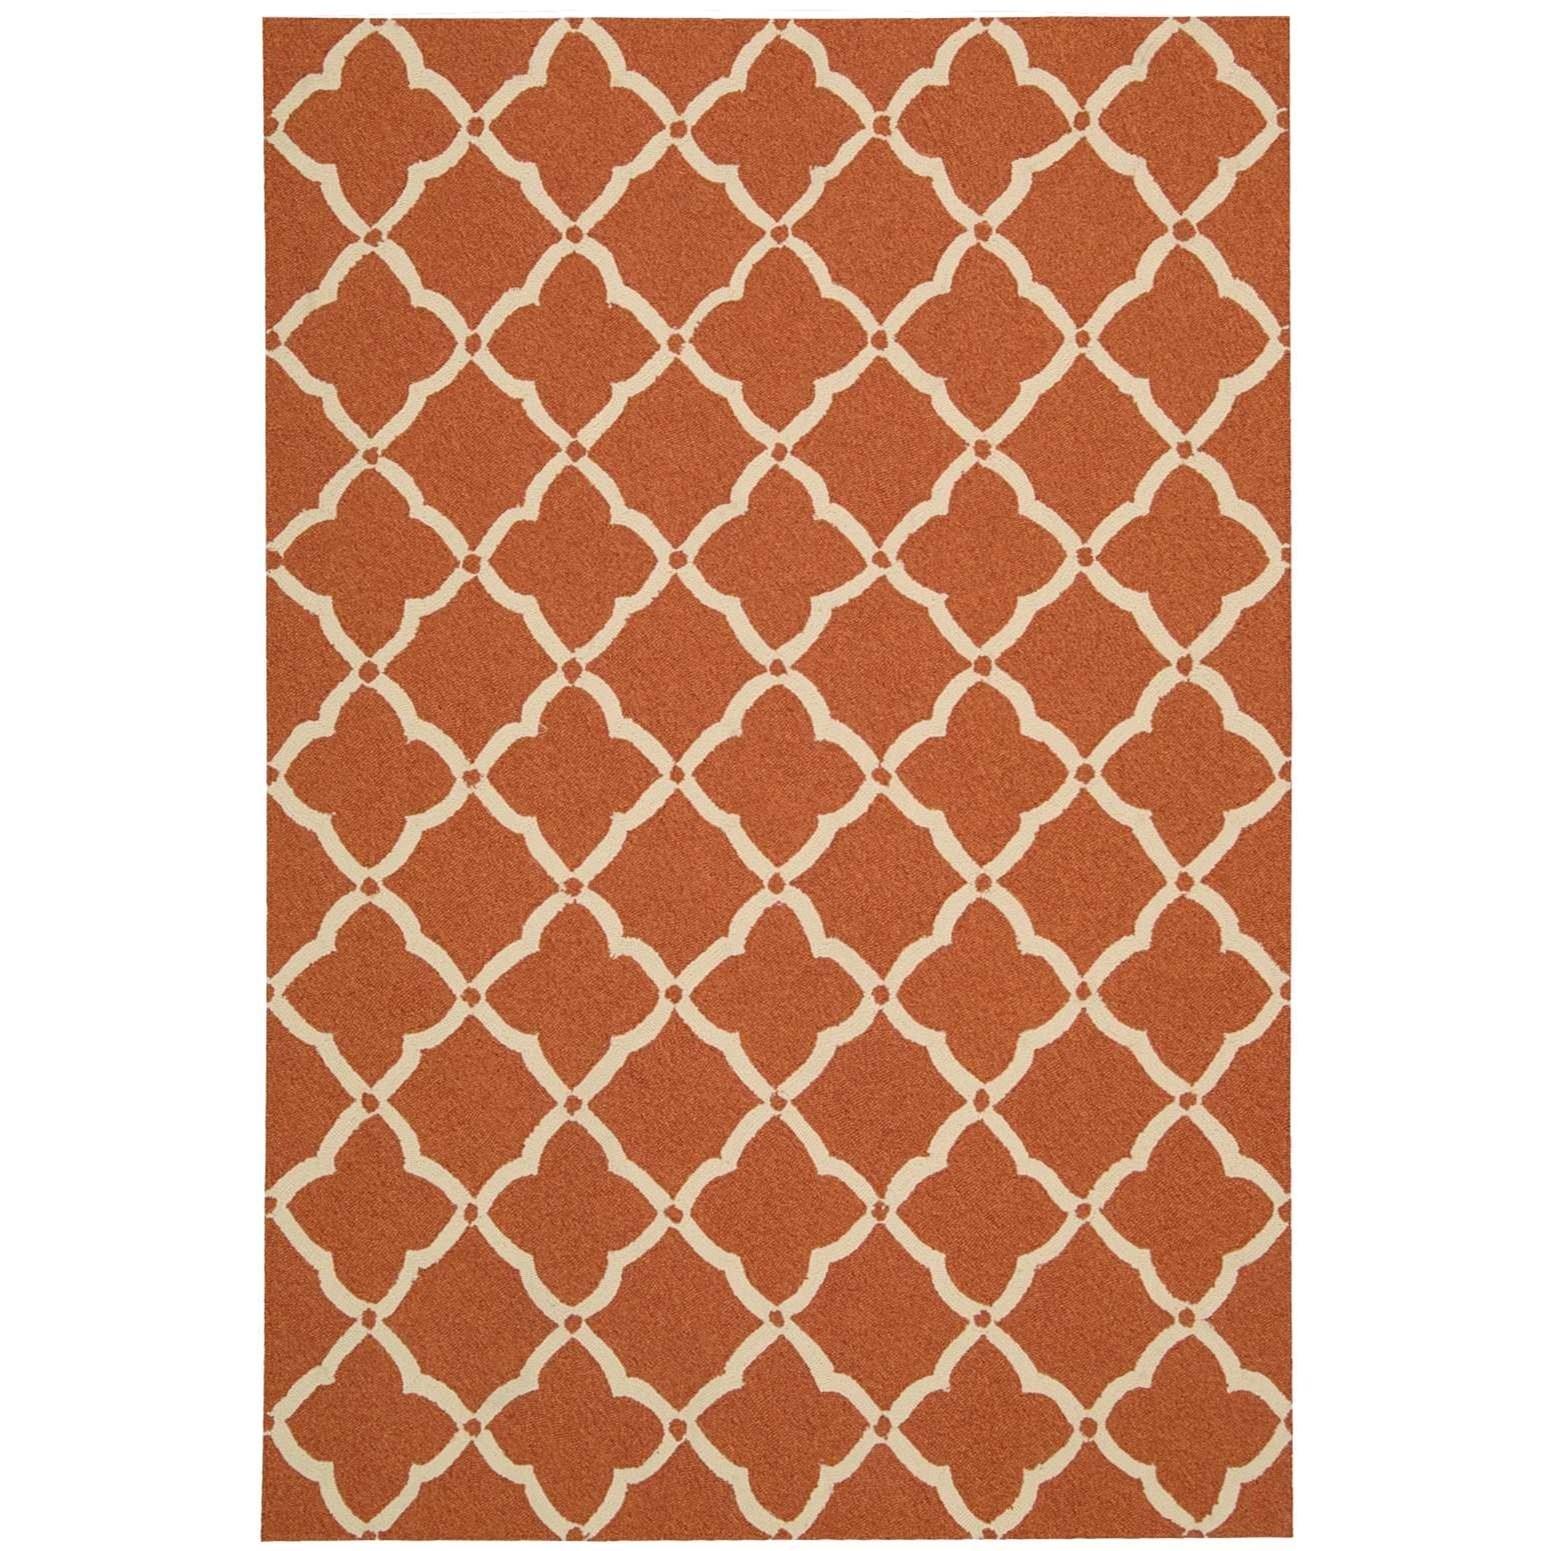 "Portico 2'3"" x 3'9"" Orange Rectangle Rug by Nourison at Sprintz Furniture"